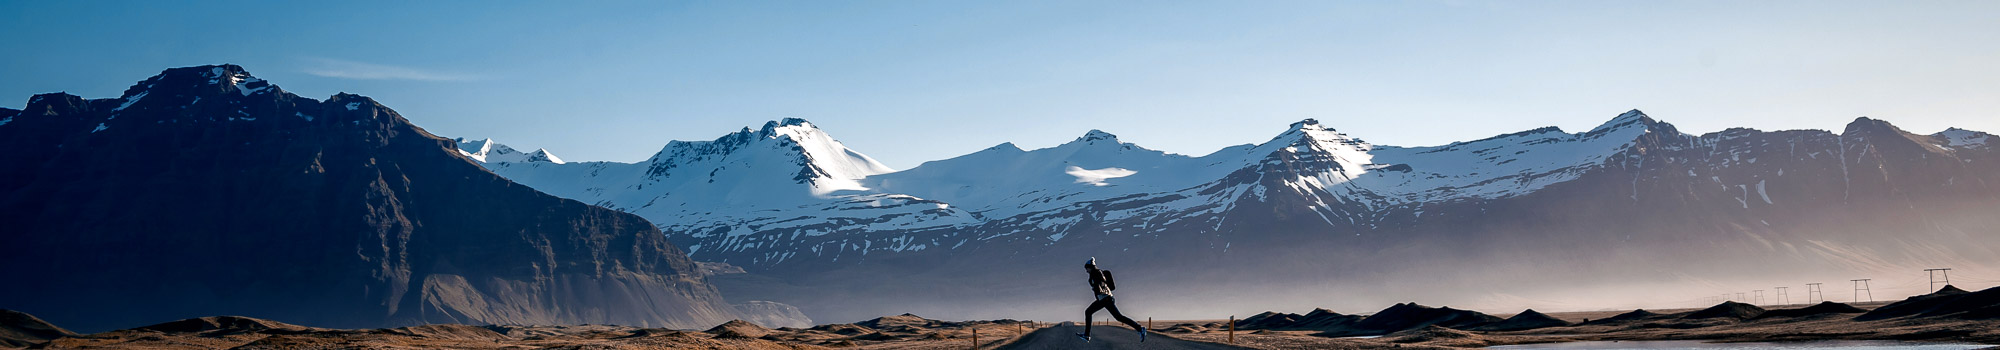 Man jumping on Winding mountain road